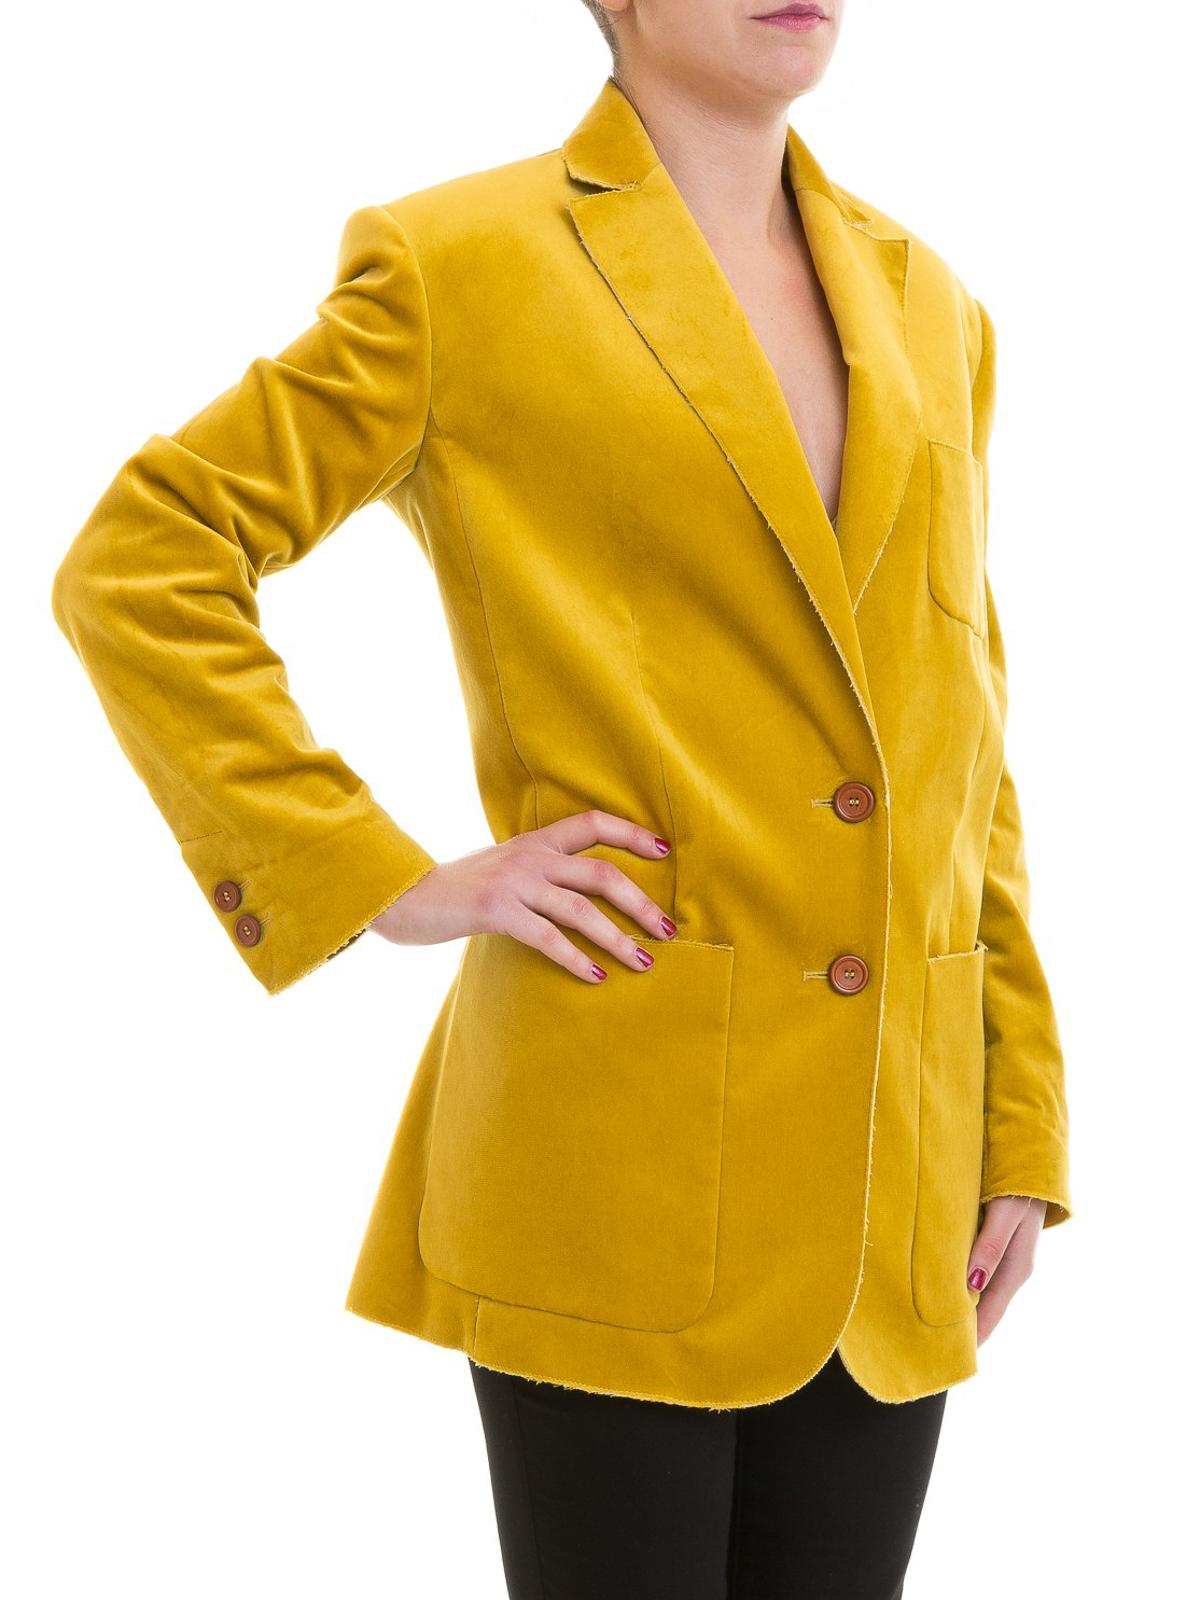 Vestes Costume M Jaune Blazer Qd3ce2102s2s20 De Missoni twFqFHg